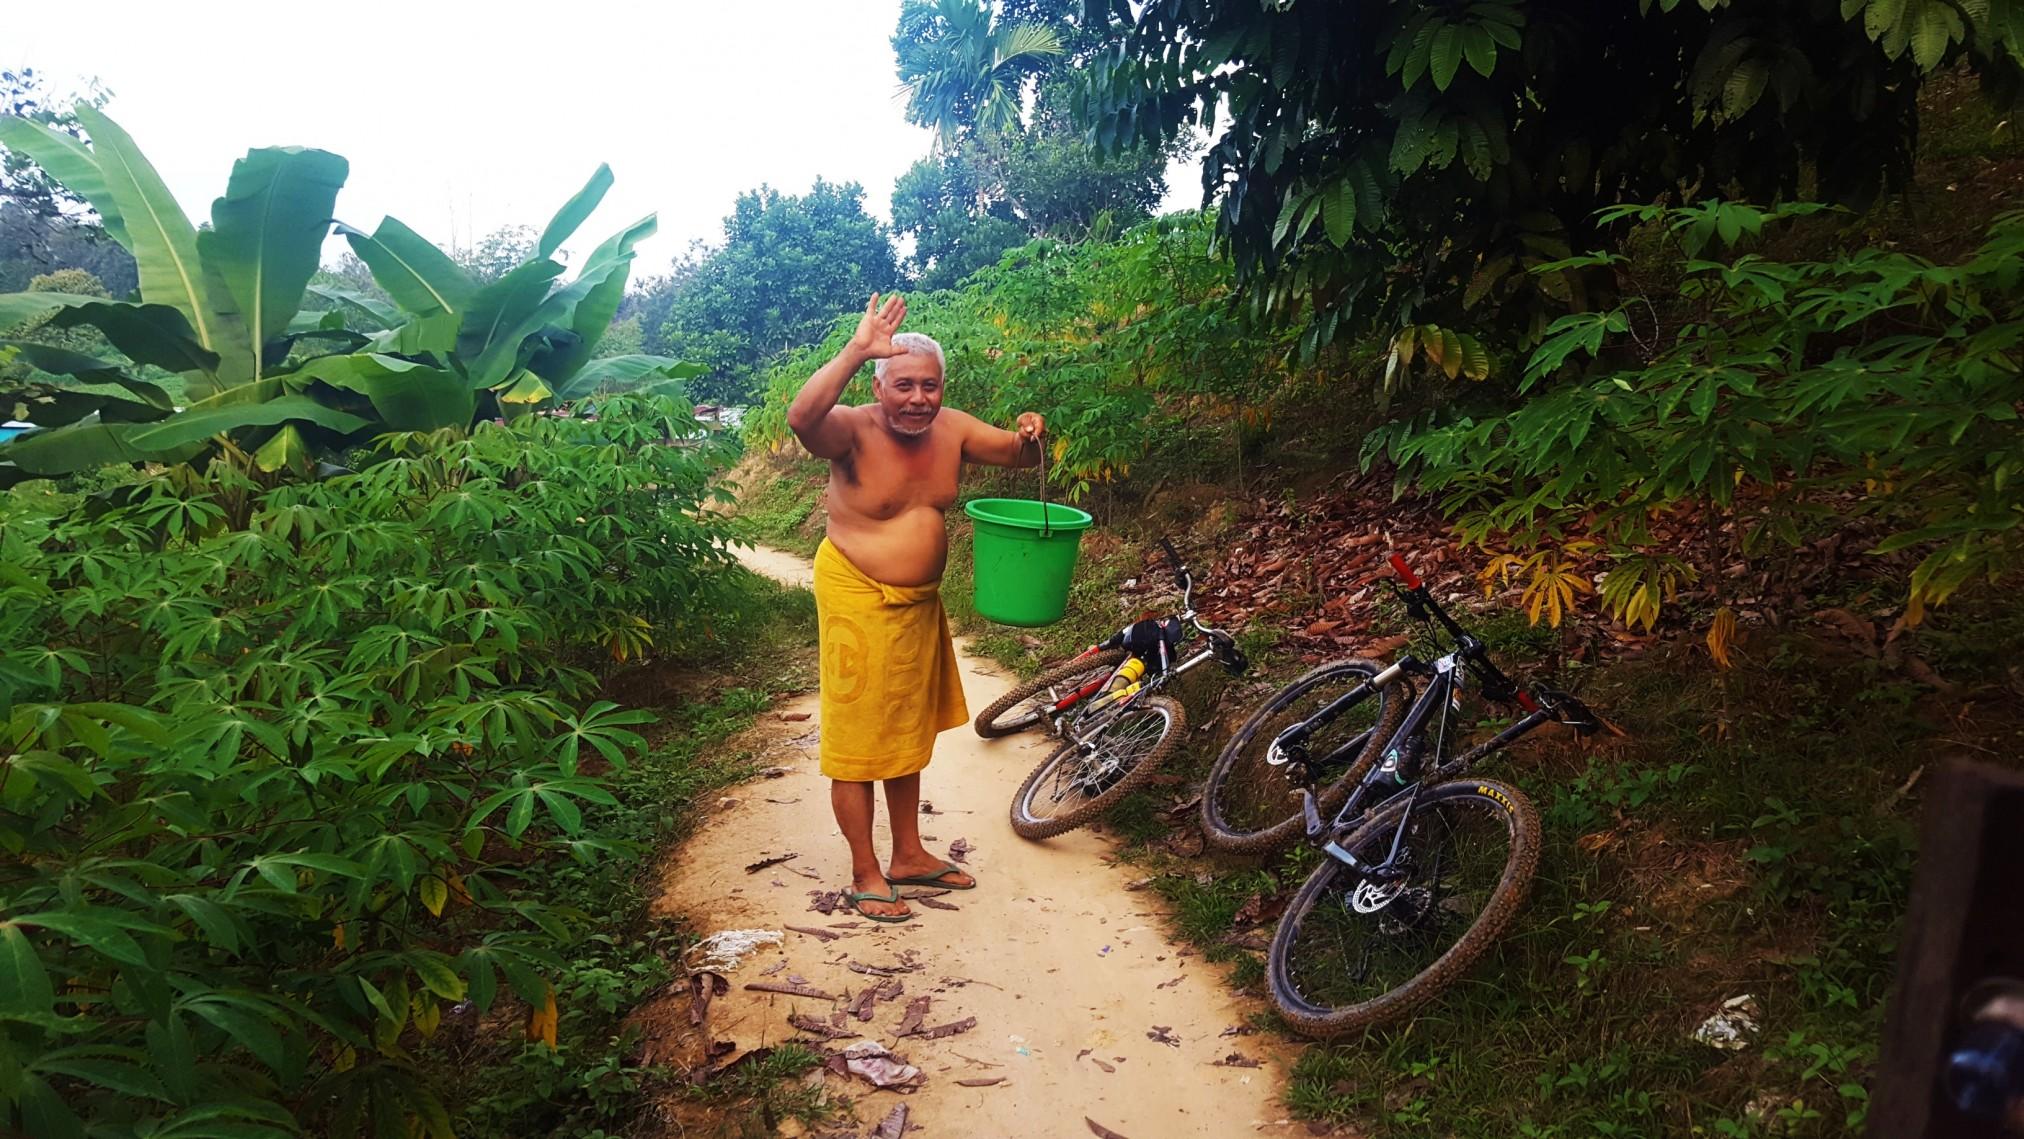 Balikpapan: On and Off the Beaten Path